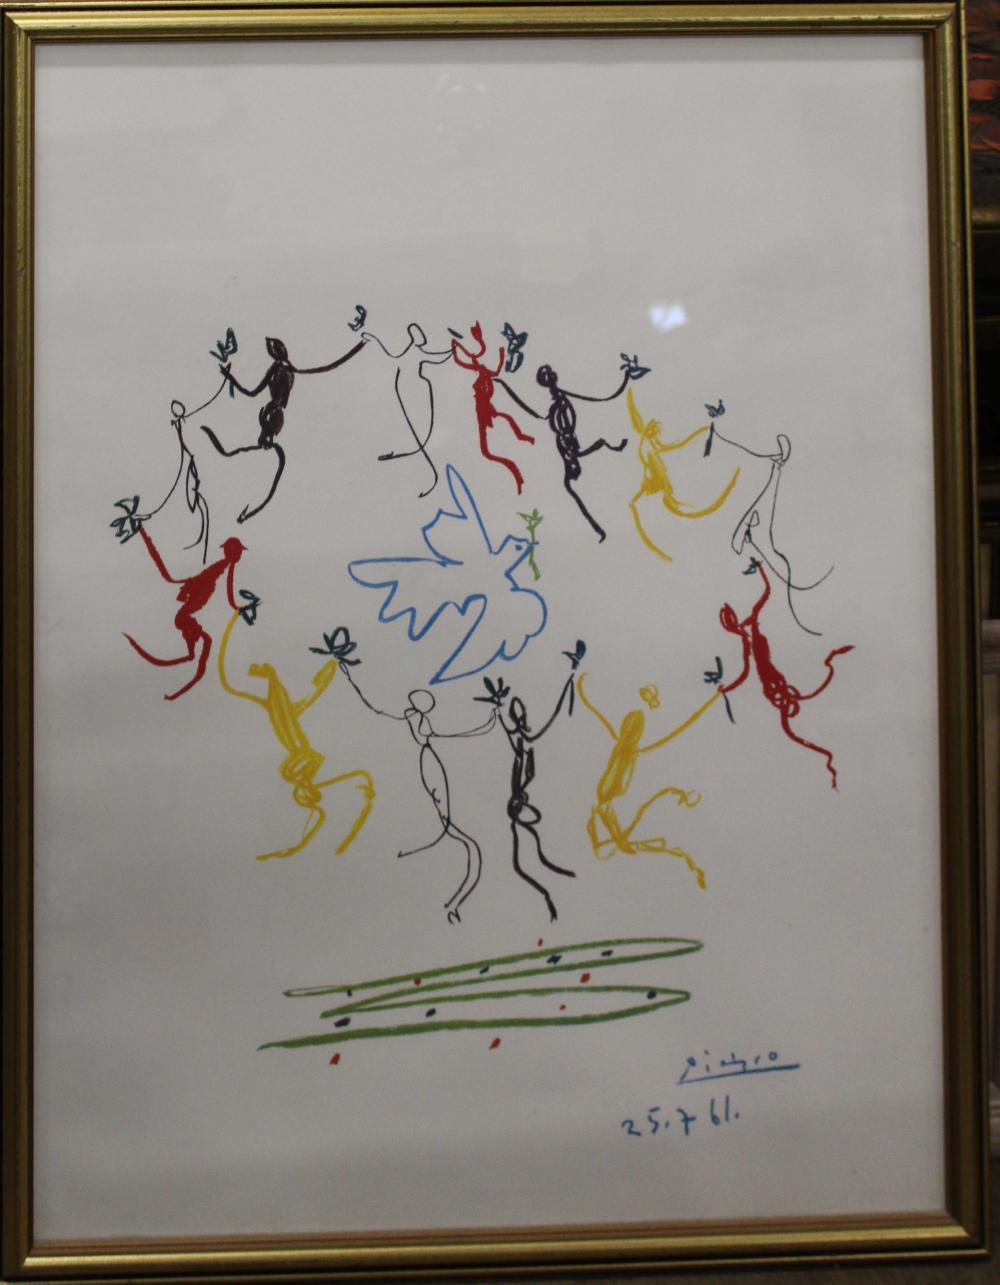 Pablo Picasso (SP 1881-1973) Dove of Peace